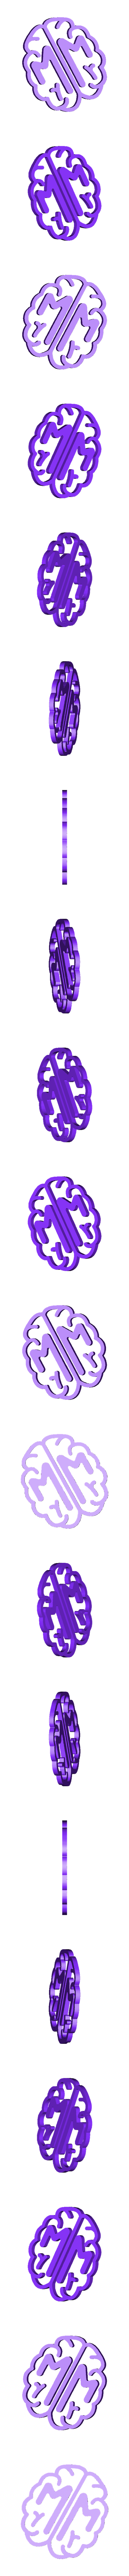 maker_mind_symbol_insert.stl Download free STL file Pencil Case With A Twist • 3D printing design, MakerMind